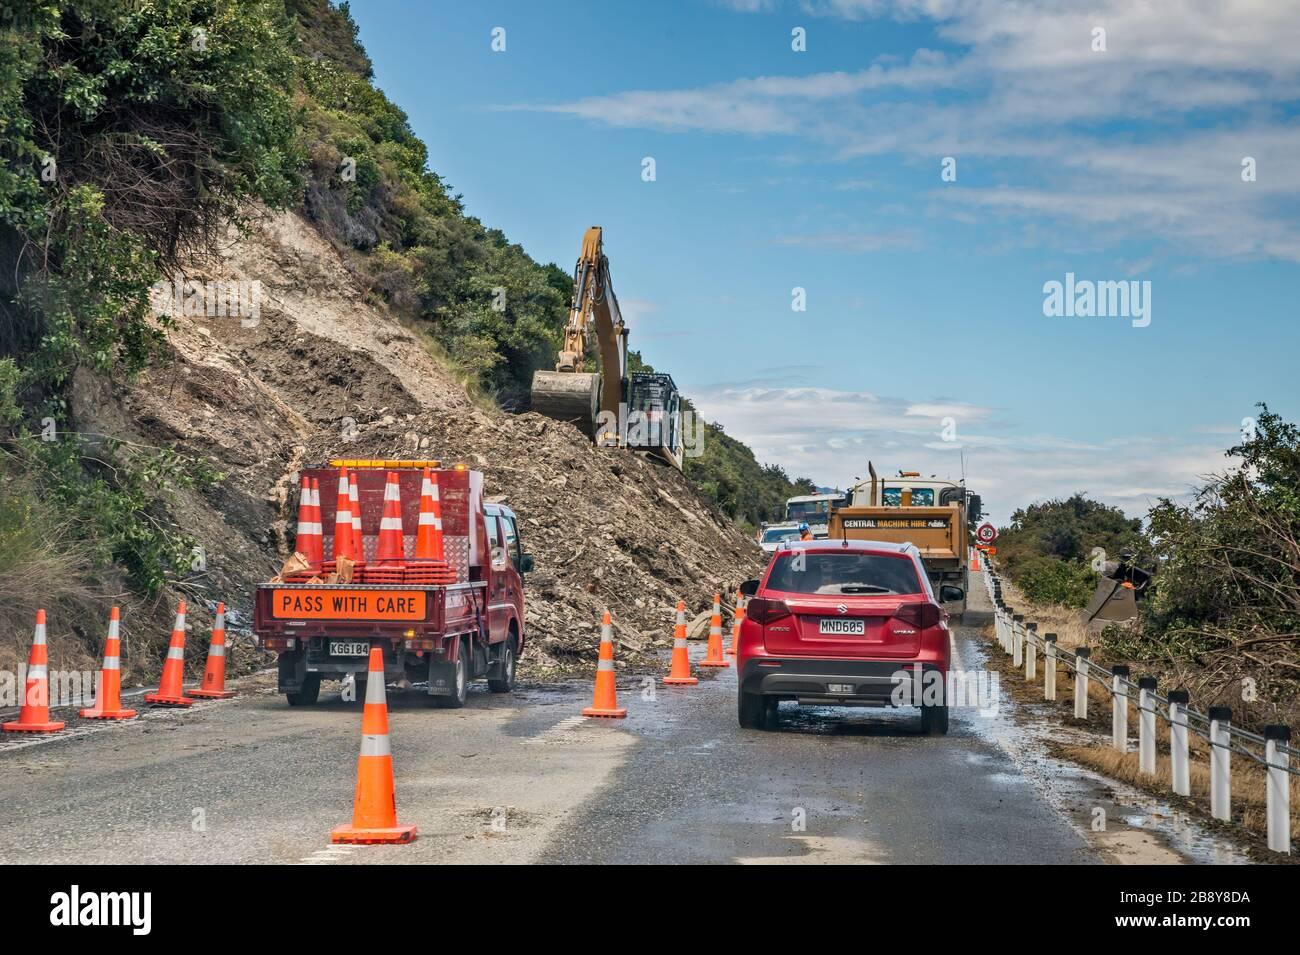 Road emergency repairs due to torrential rain landslide on Makarora Lake Hawea Road, Otago Region, South Island, New Zealand Stock Photo